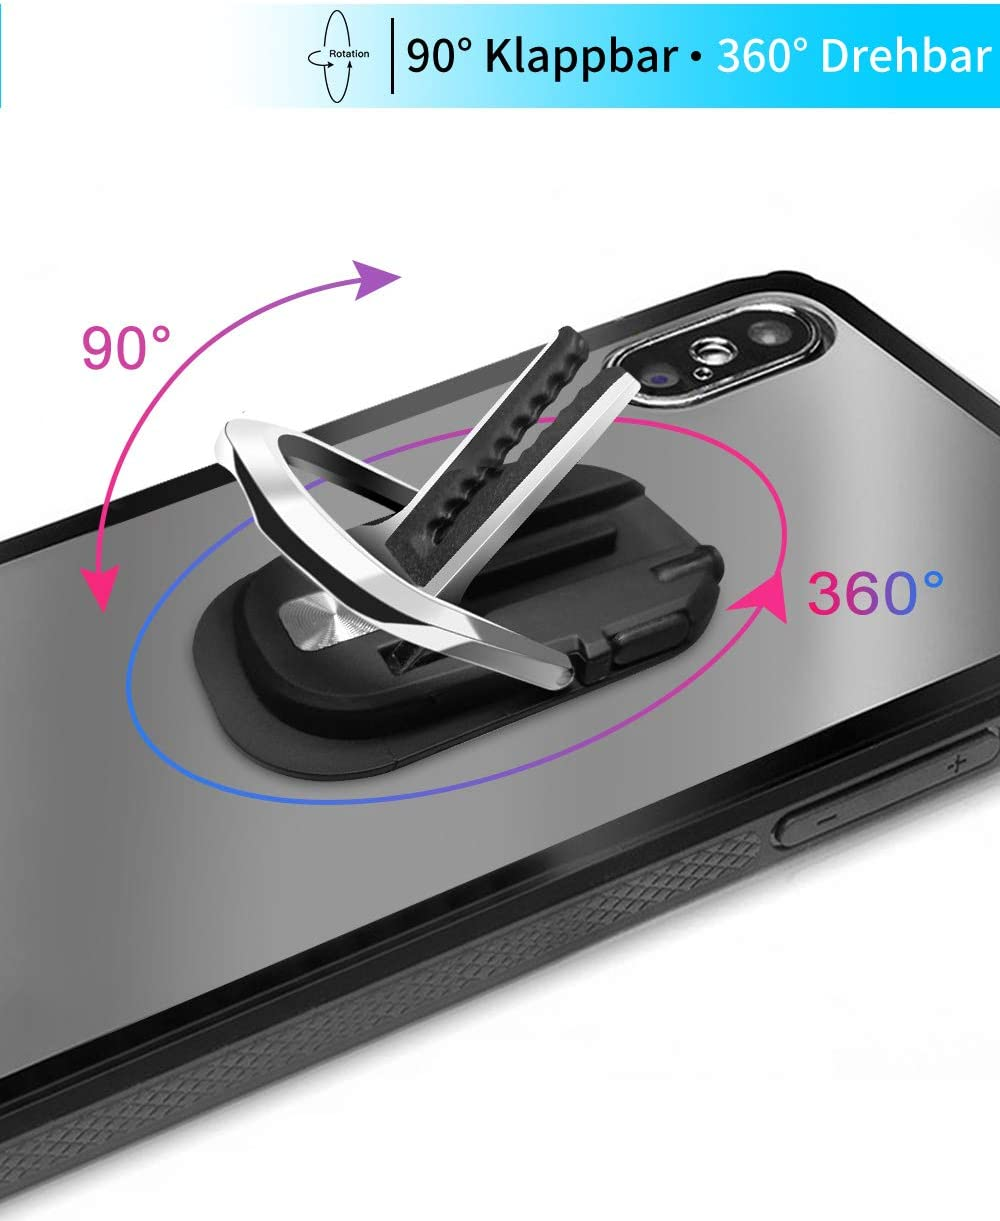 Foncent Anillo Soporte M/óvil Titular del Tel/éfono,Anillo Soporte para Movil 360/° rotaci/ón,Soporte Tel/éfono para iPhone Tablet y Smartphone Universal 2 Piezas